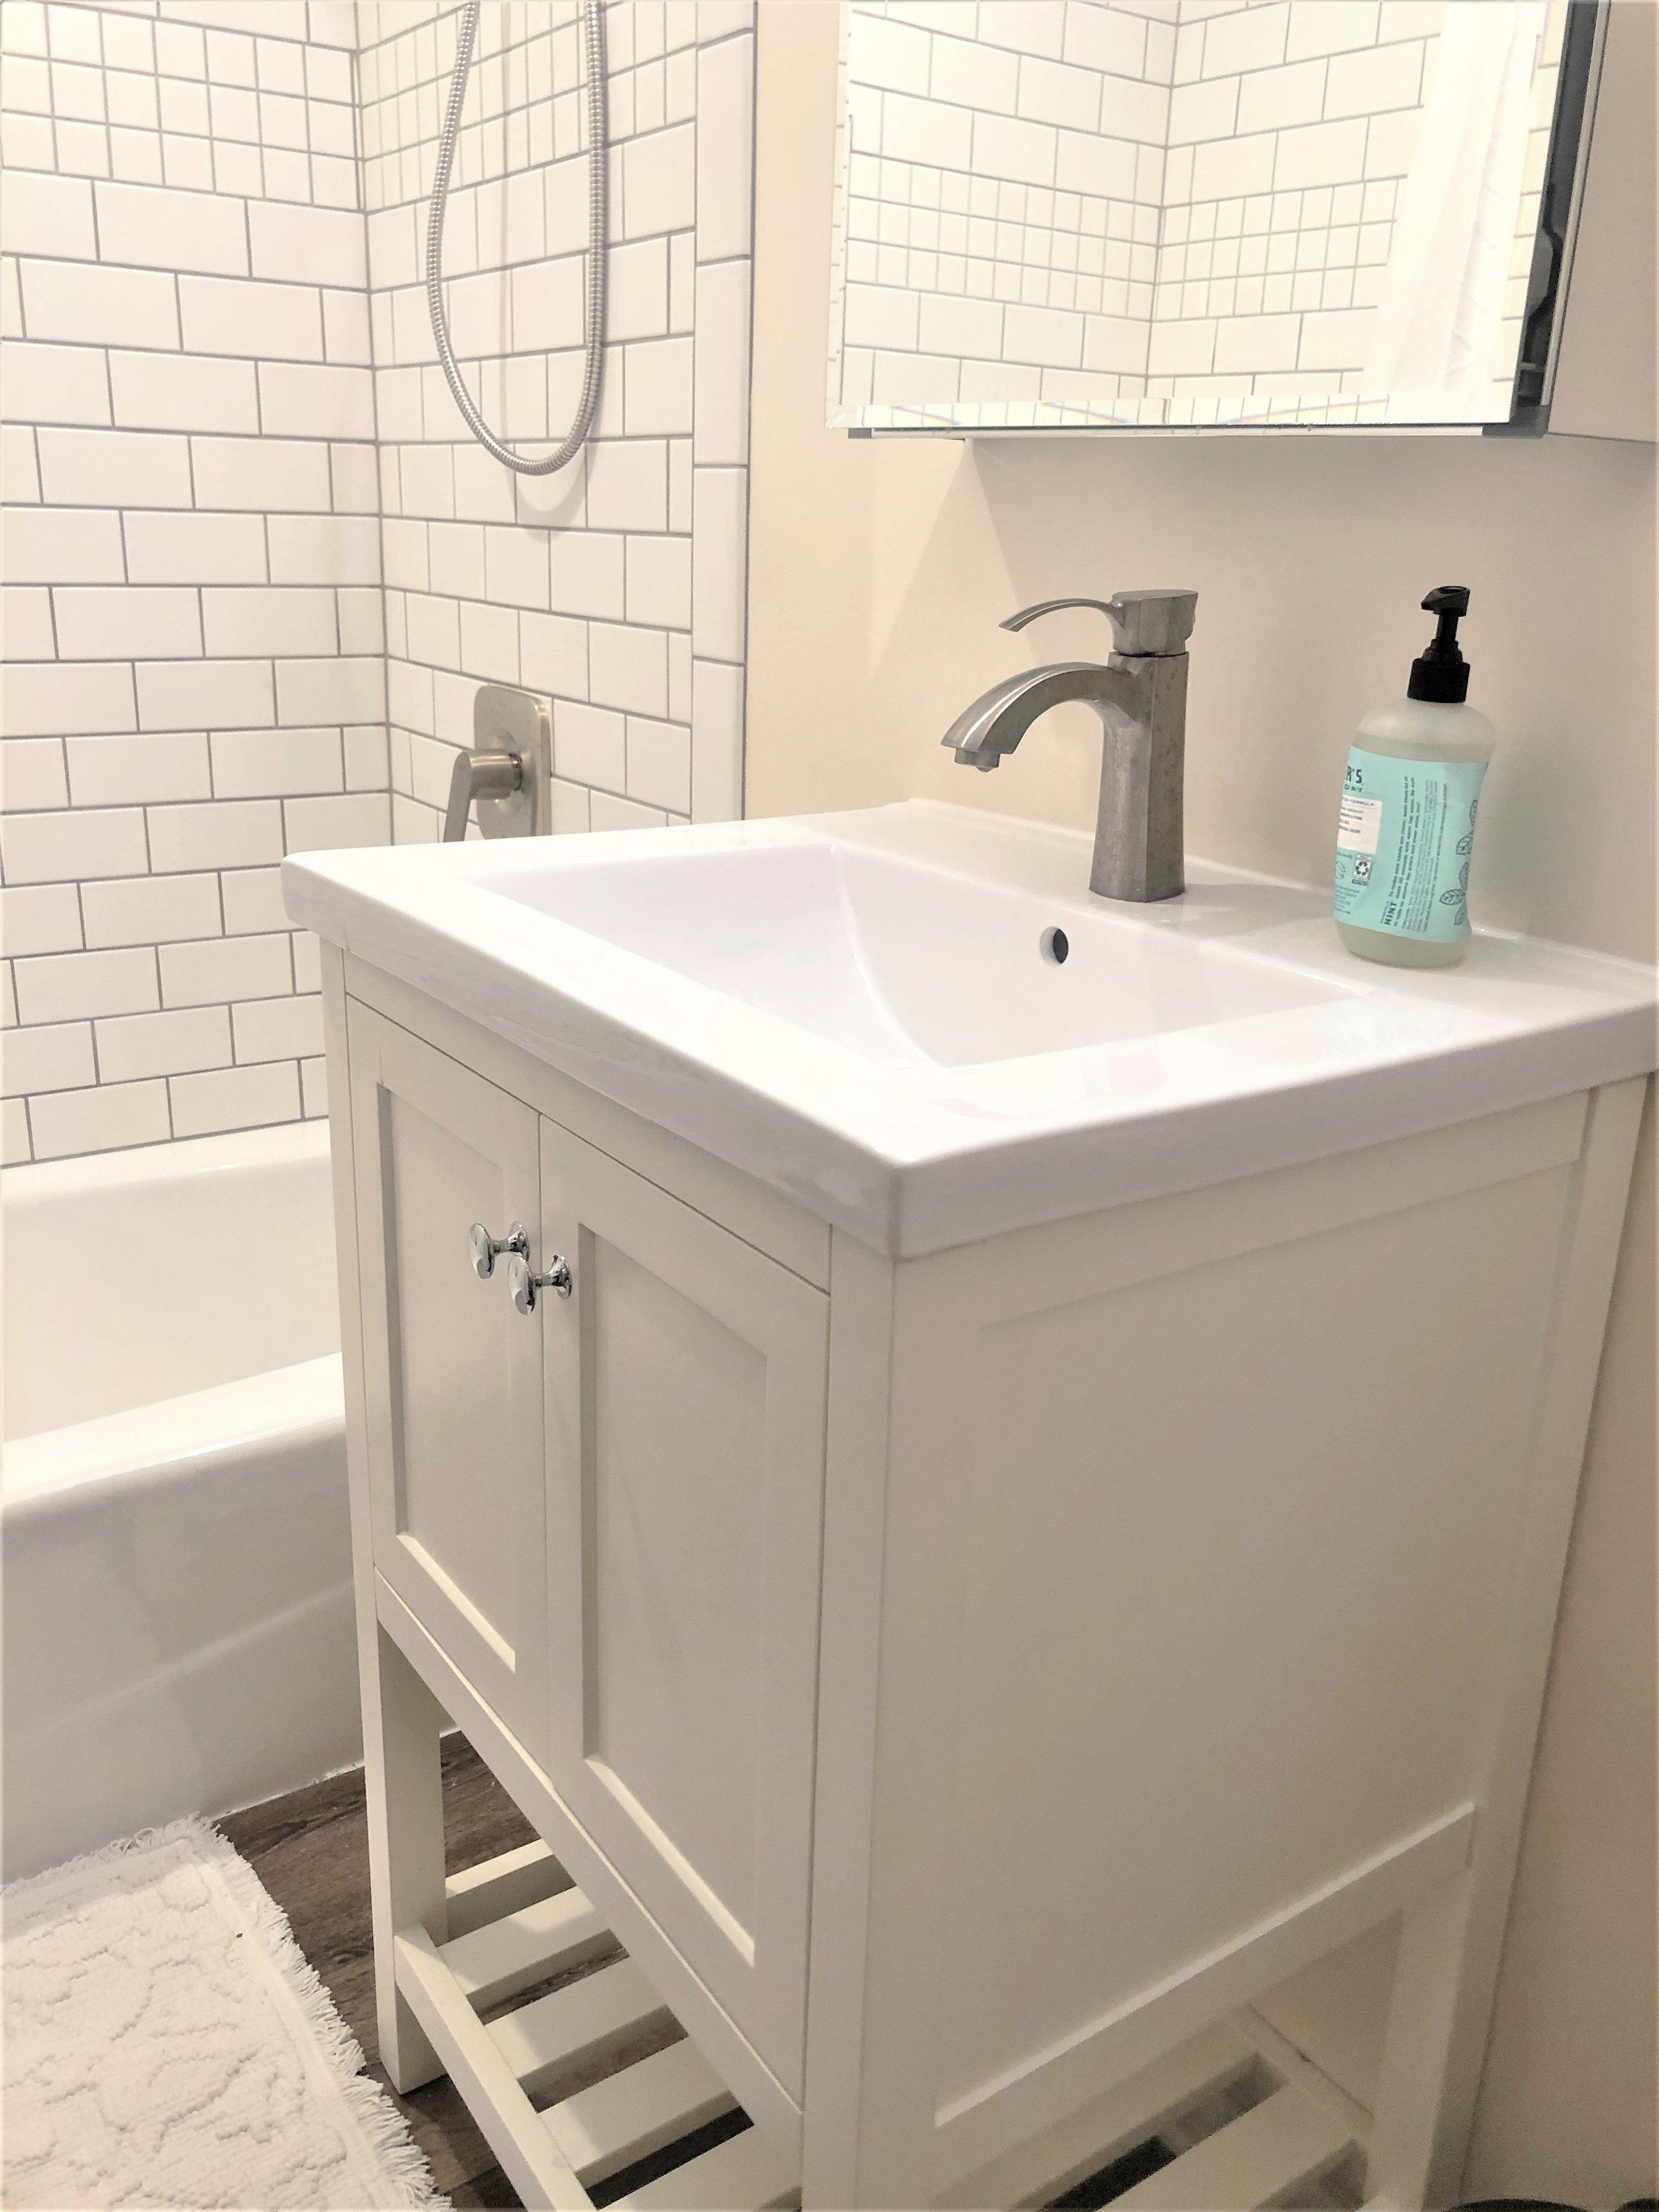 Renovated Ann Arbor bathroom